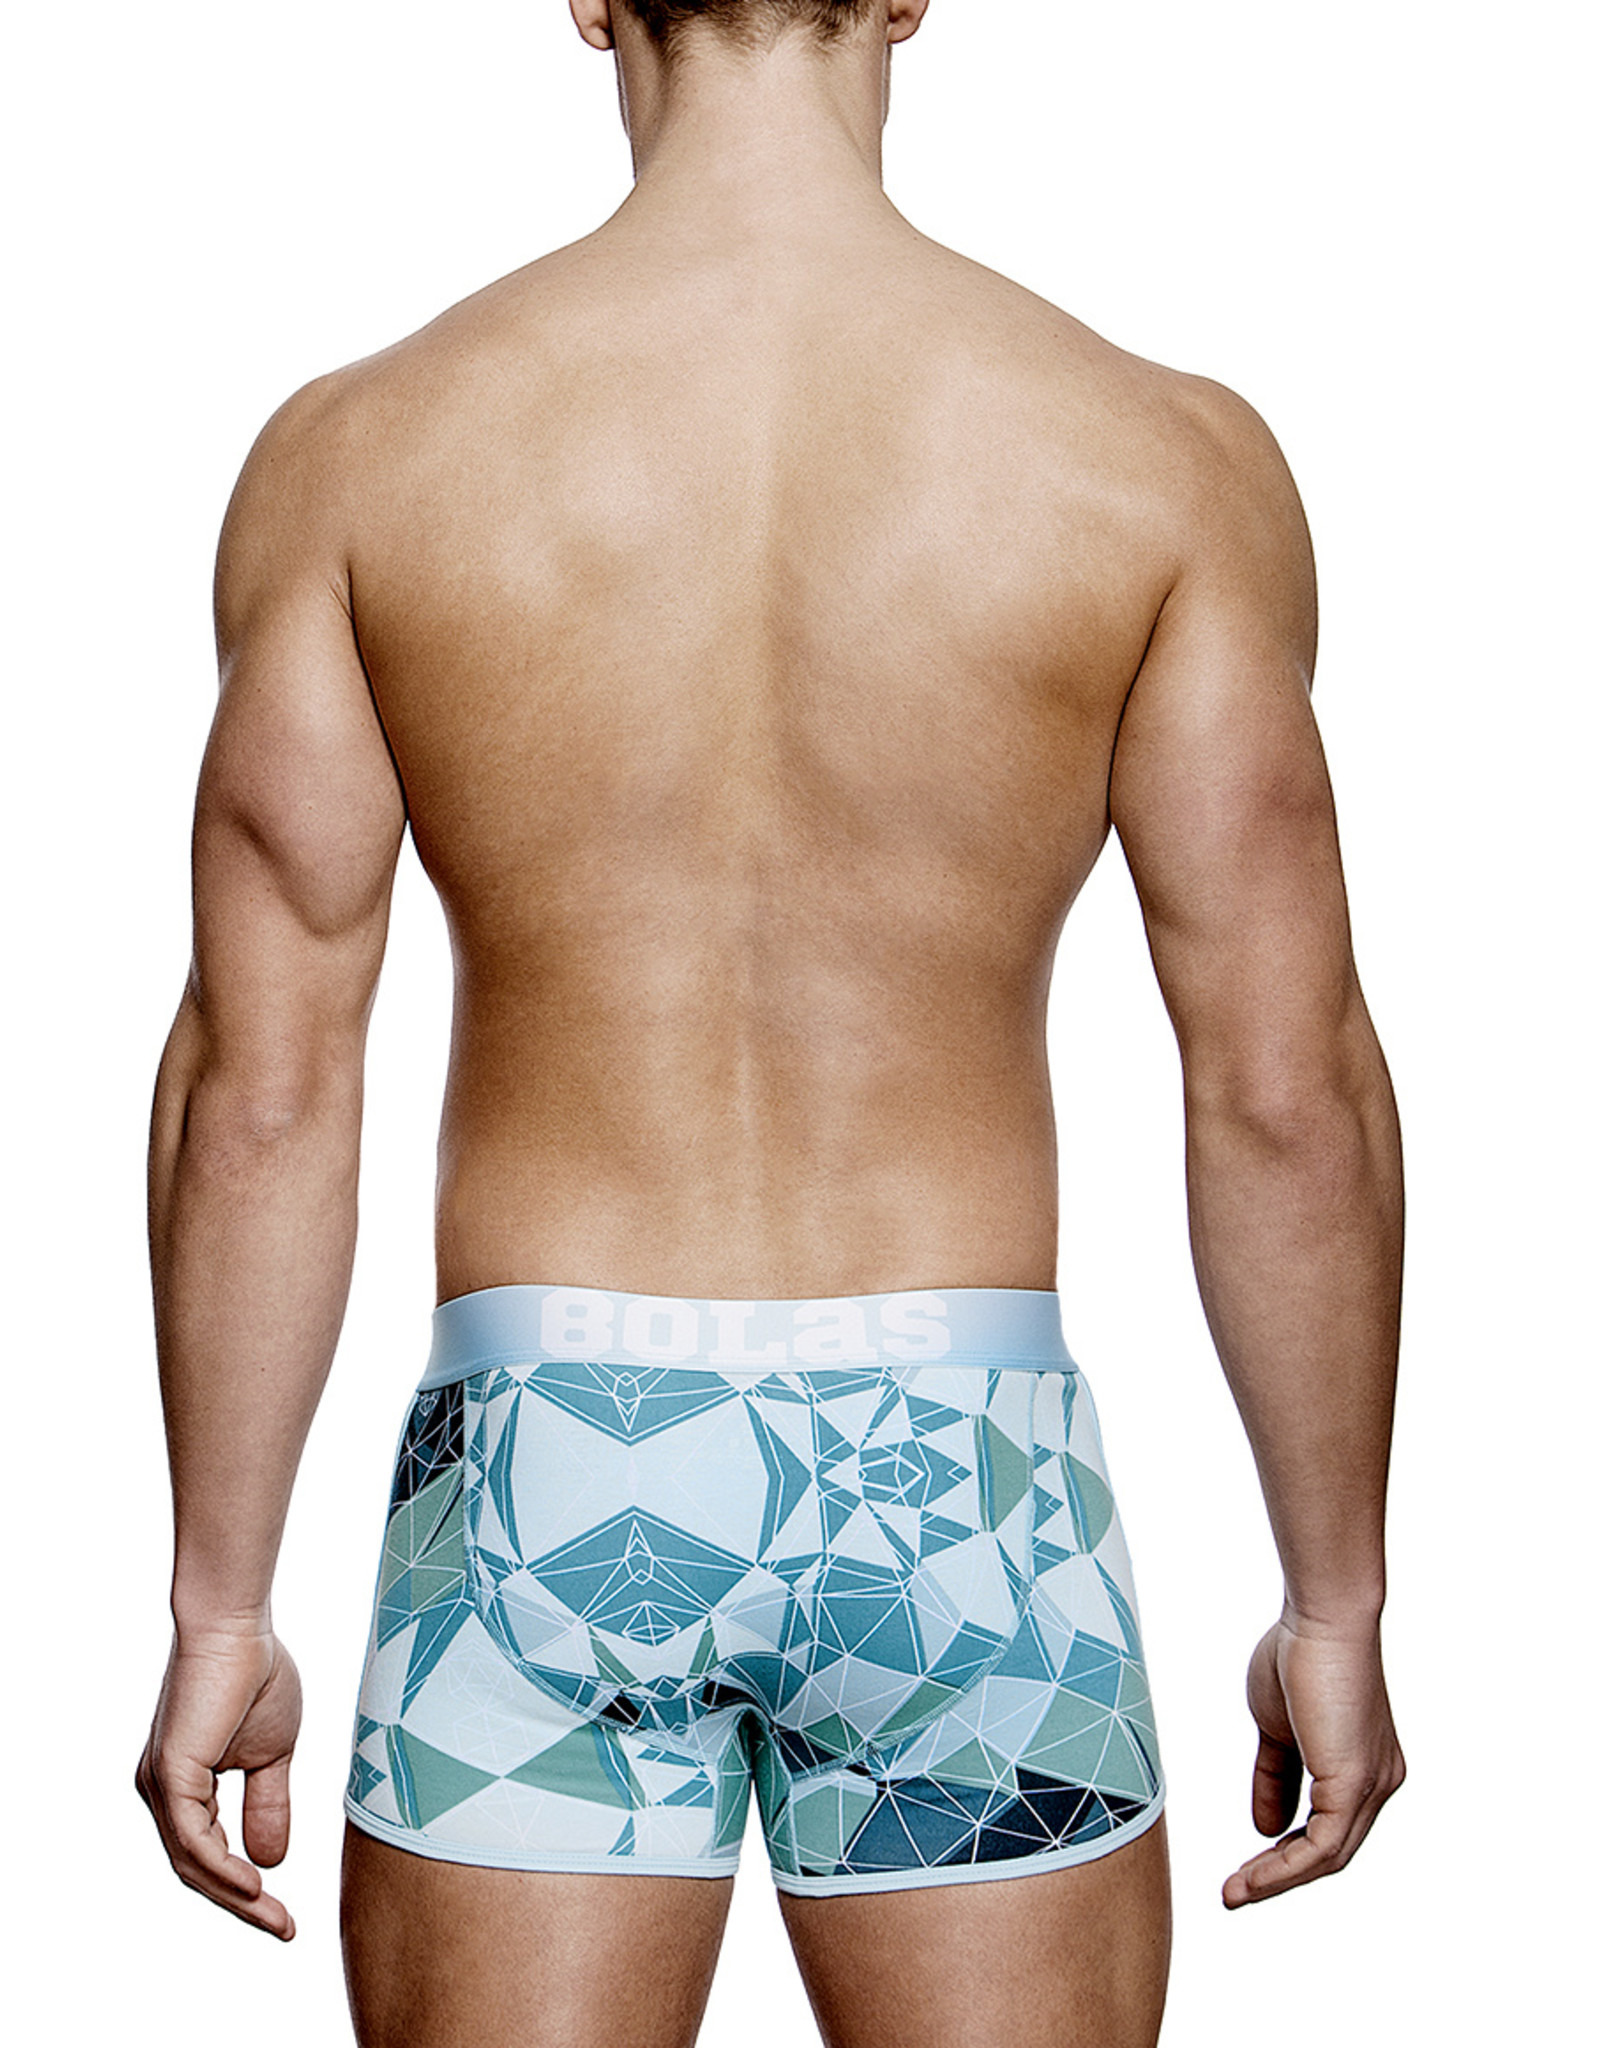 Bolas Underwear Water